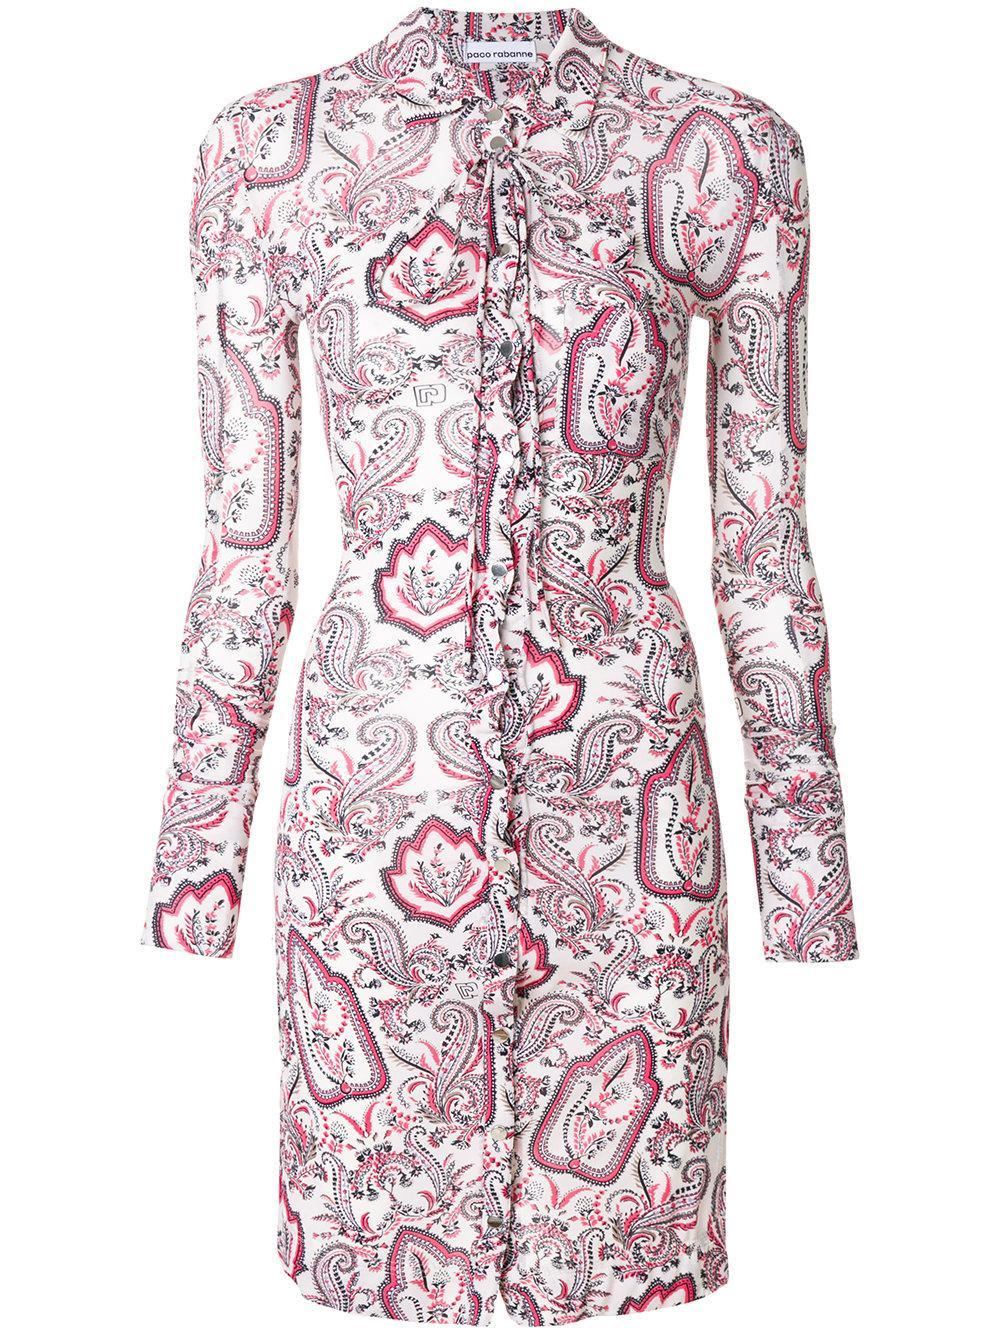 Paco Rabanne Paisley Print Shirt Dress